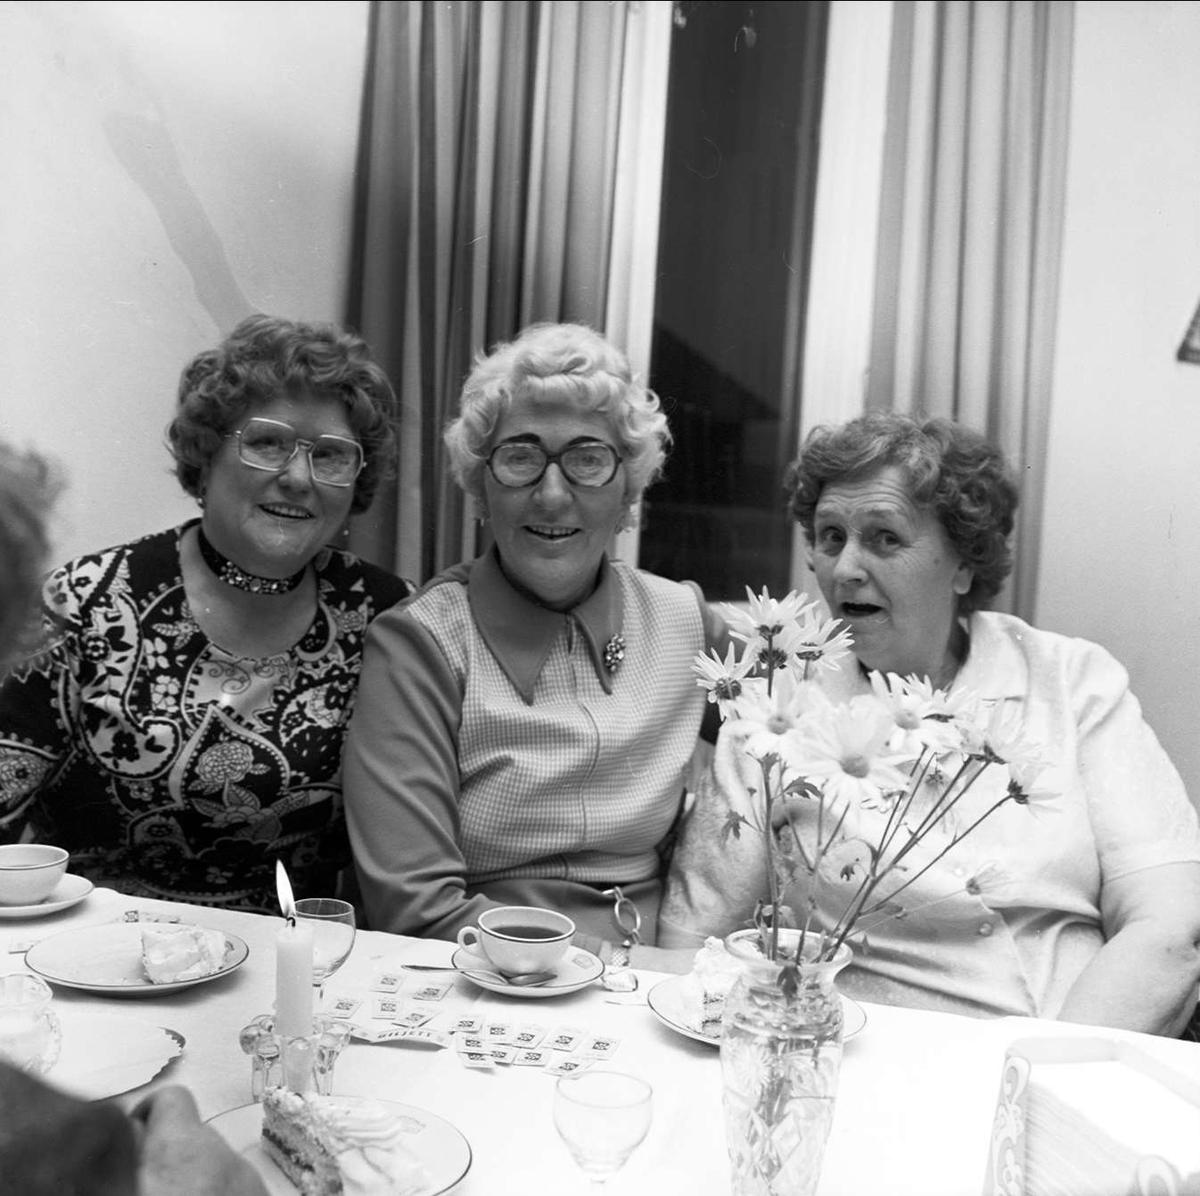 DHR-fest i Tierp, Uppland december 1972